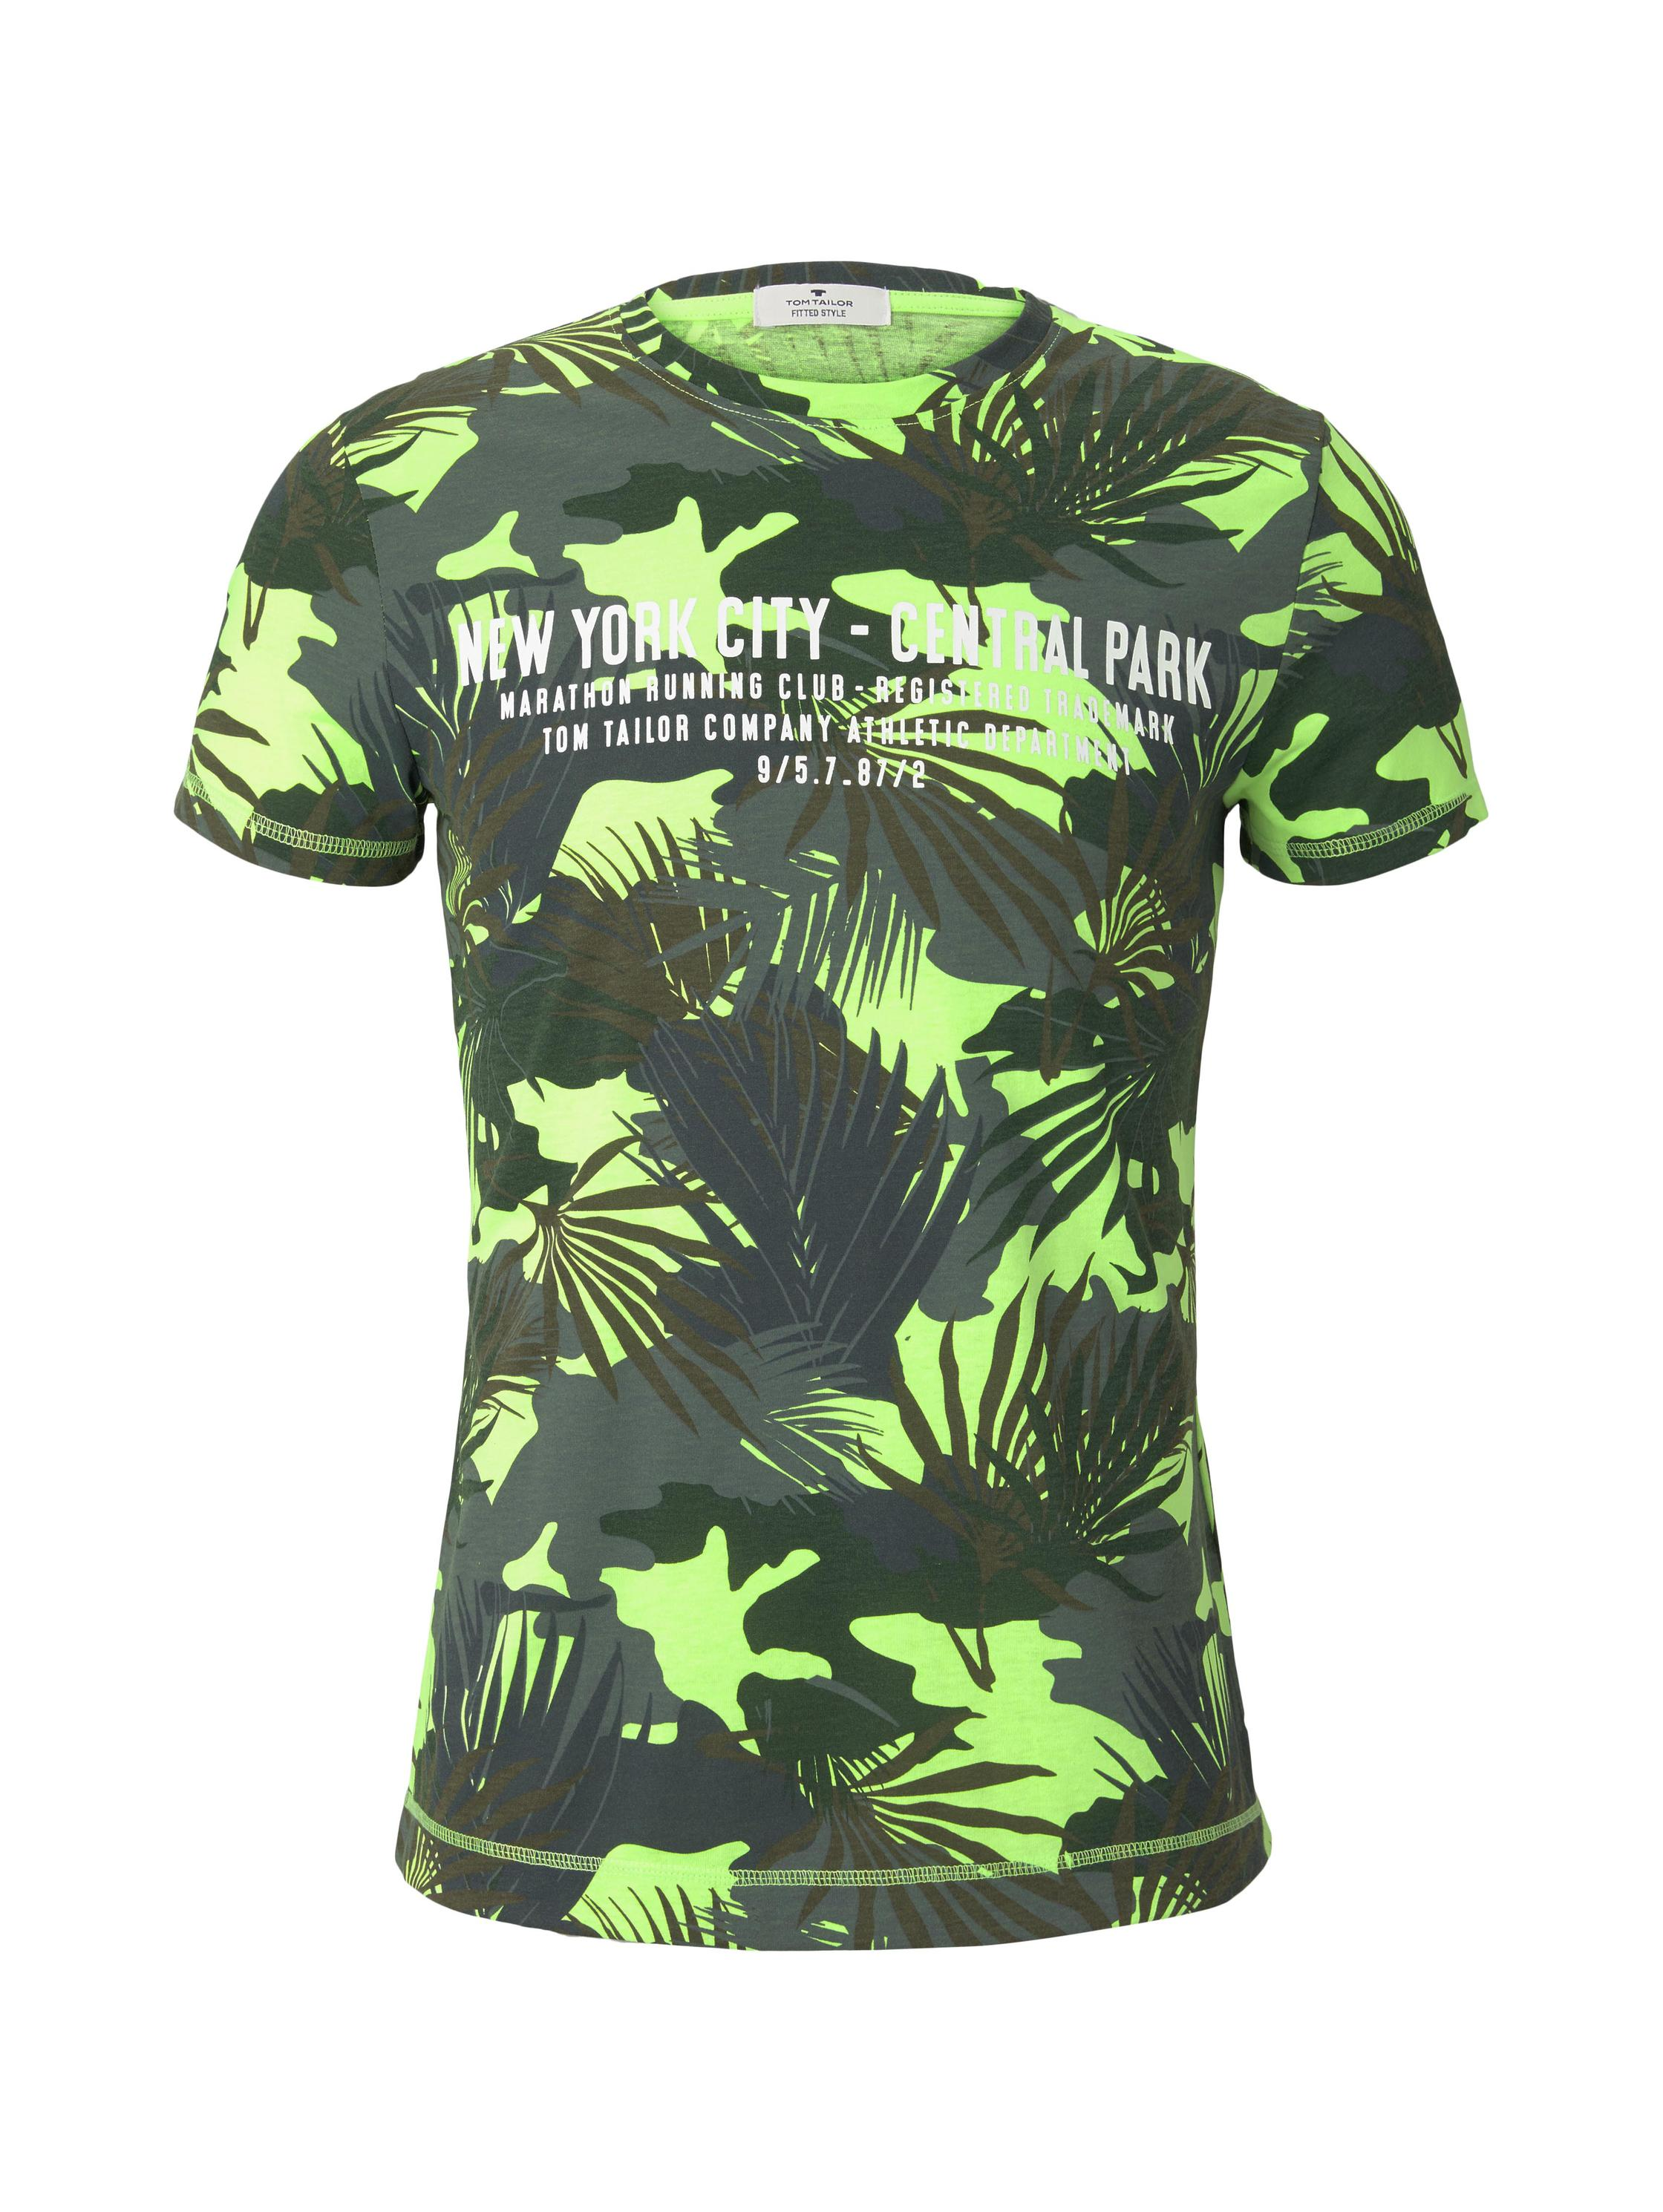 allover printed t-shirt, green leaf design